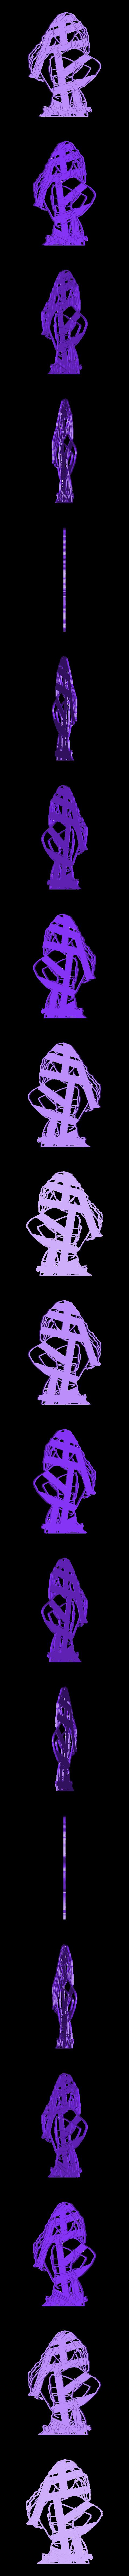 Mohana Adulta.stl Download STL file COOKIES CUTTER Moana Mohana Adulta, CORTANTE DE GALLETAS Moana Mohana Adulta • 3D printer object, diegox484